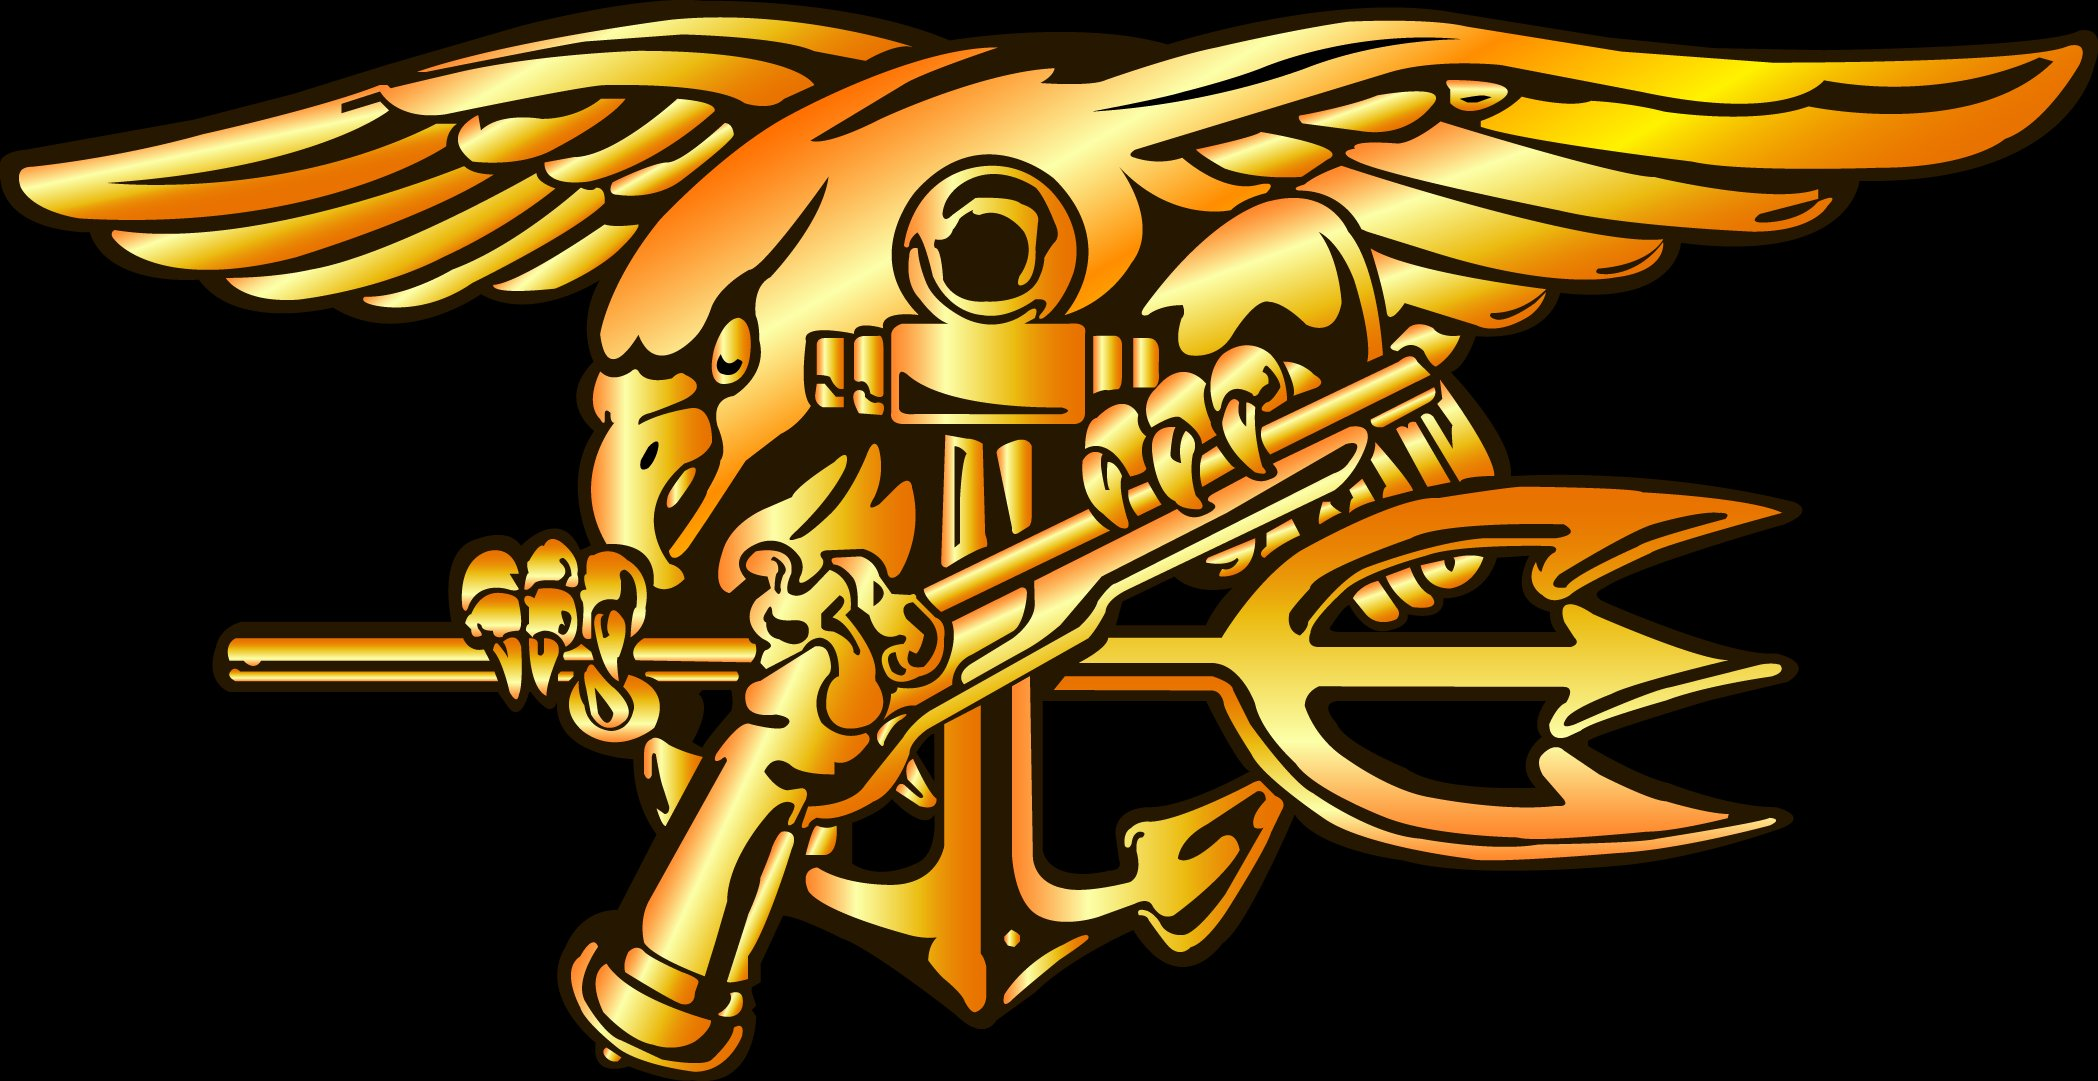 Us Navy Images Logo Wallpaper: Navy Logo Military Poster (1) Wallpaper